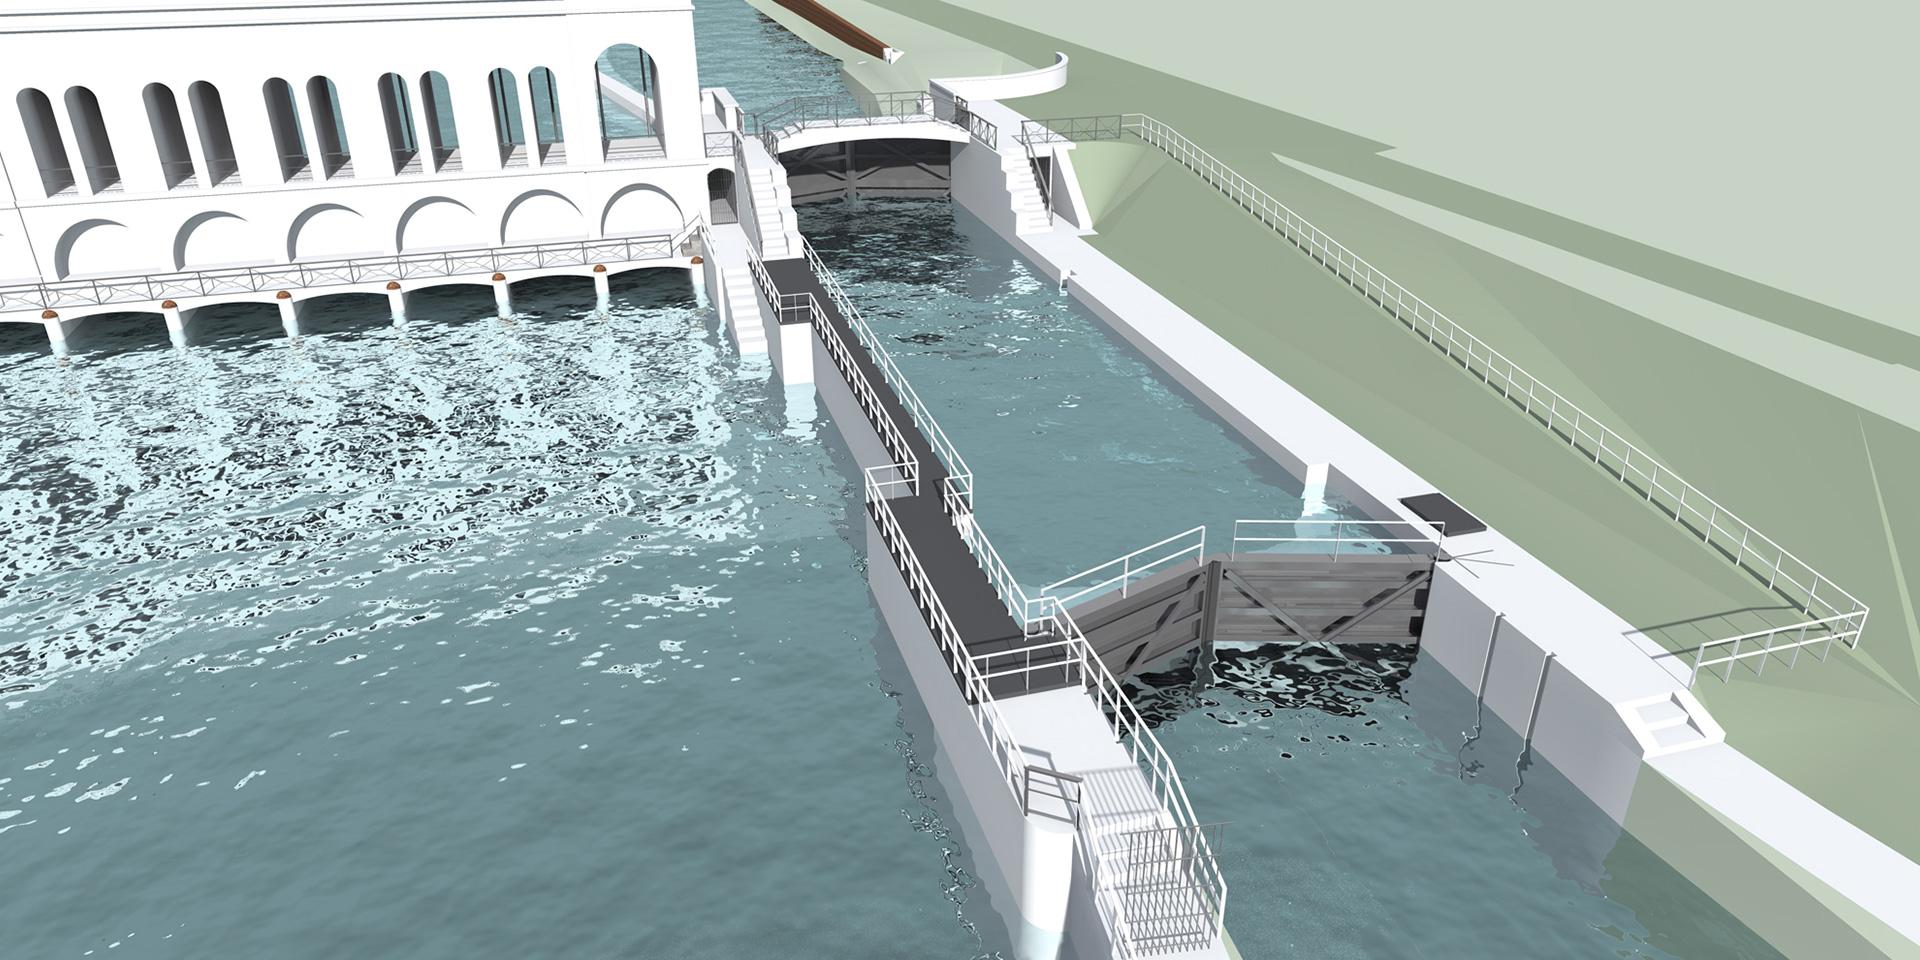 Conca di navigazione a Panperduto, Binini Partners, Società di architettura e ingegneria